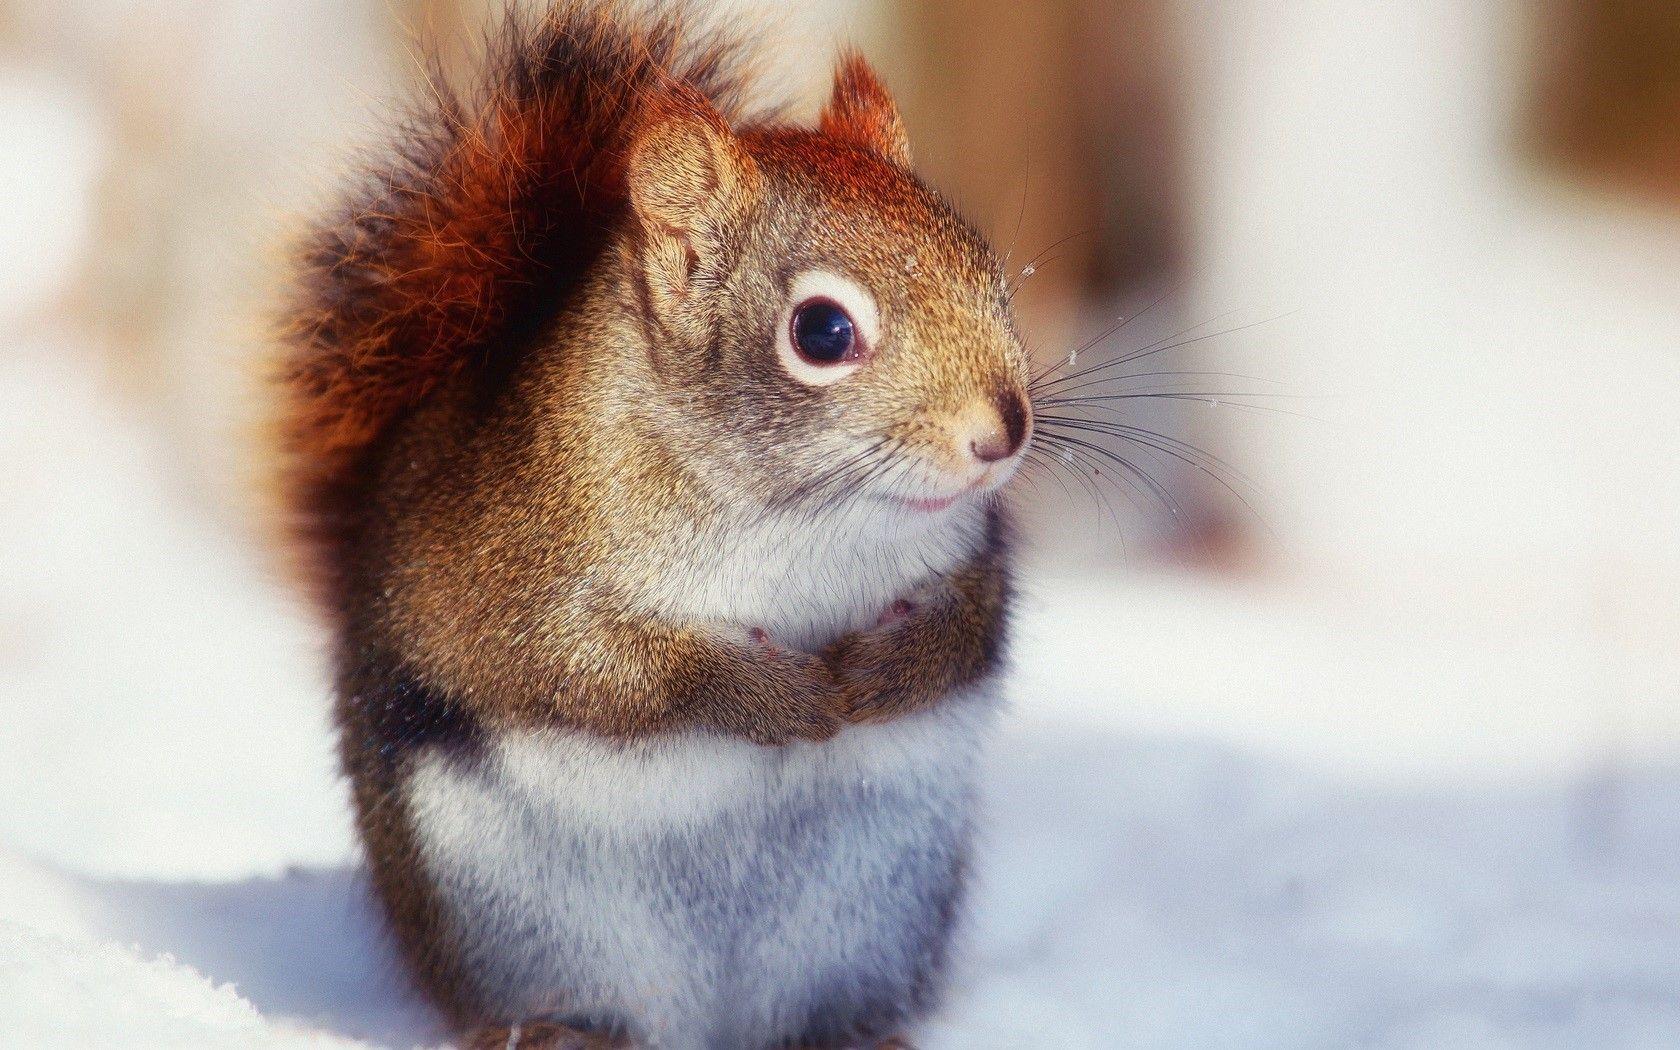 Cute Nice Squirrel Wallpaper Free Download Animal wallpaper